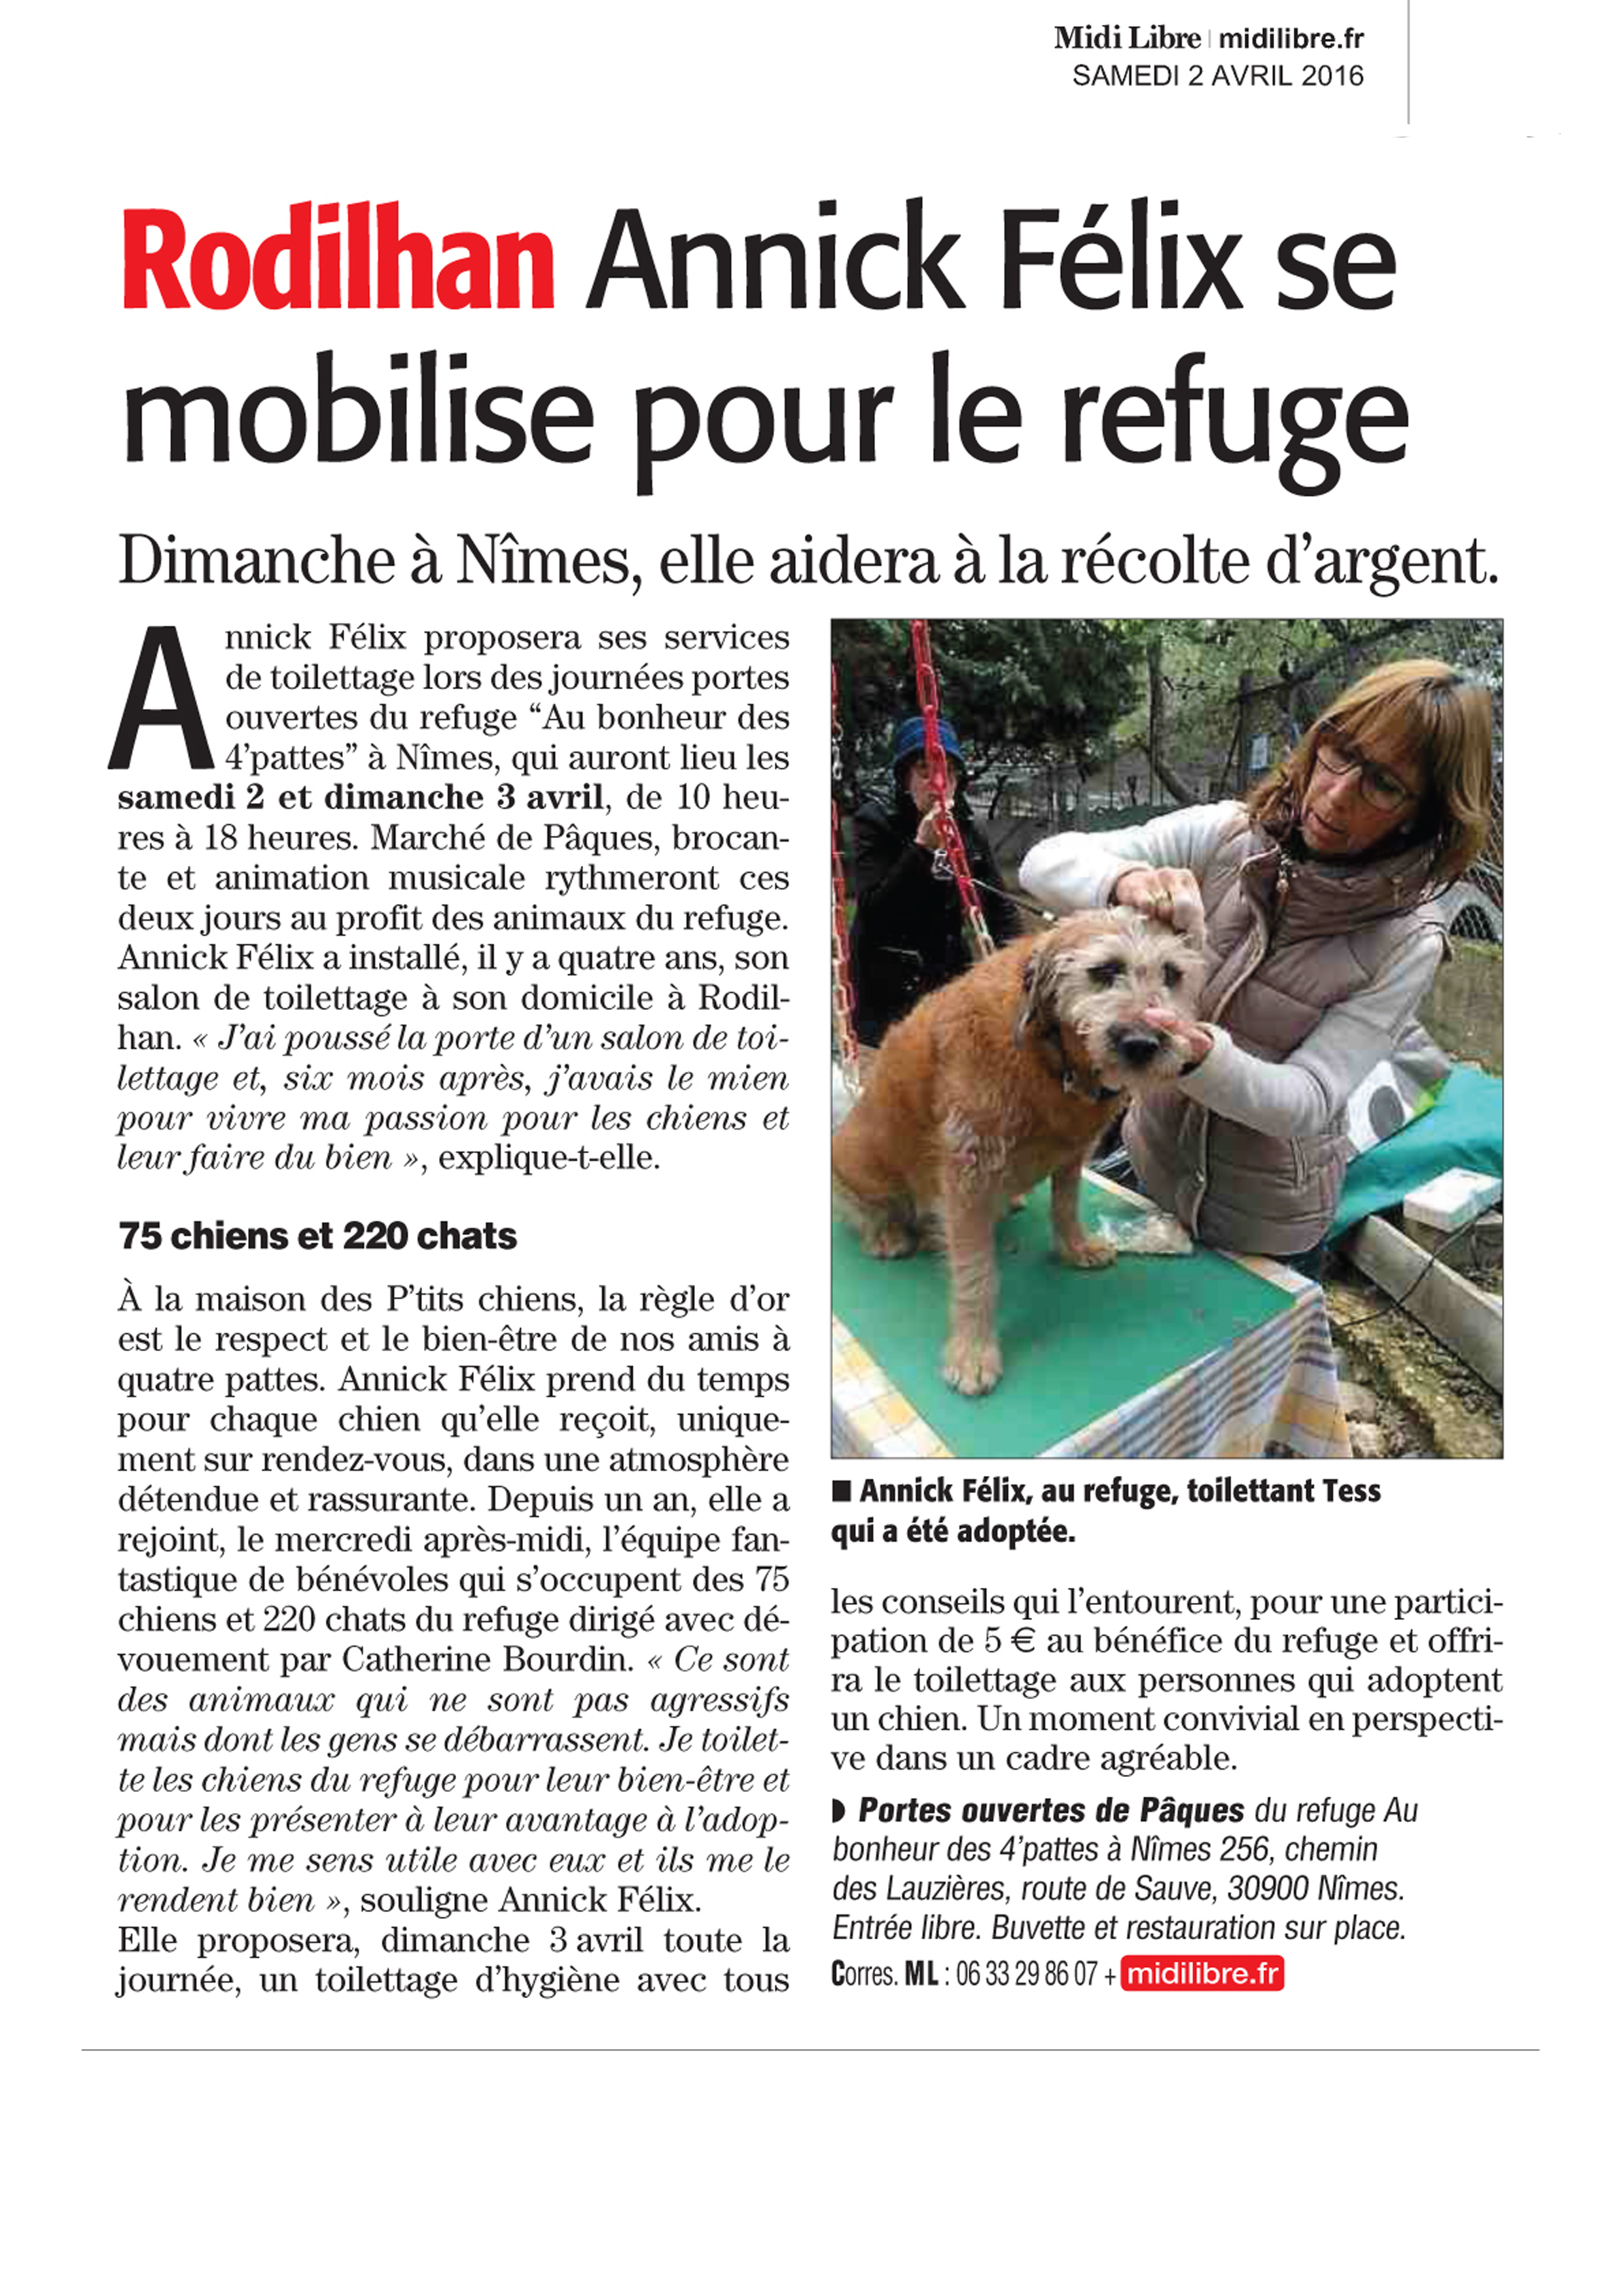 Midi_Libre_Refuge_04-16